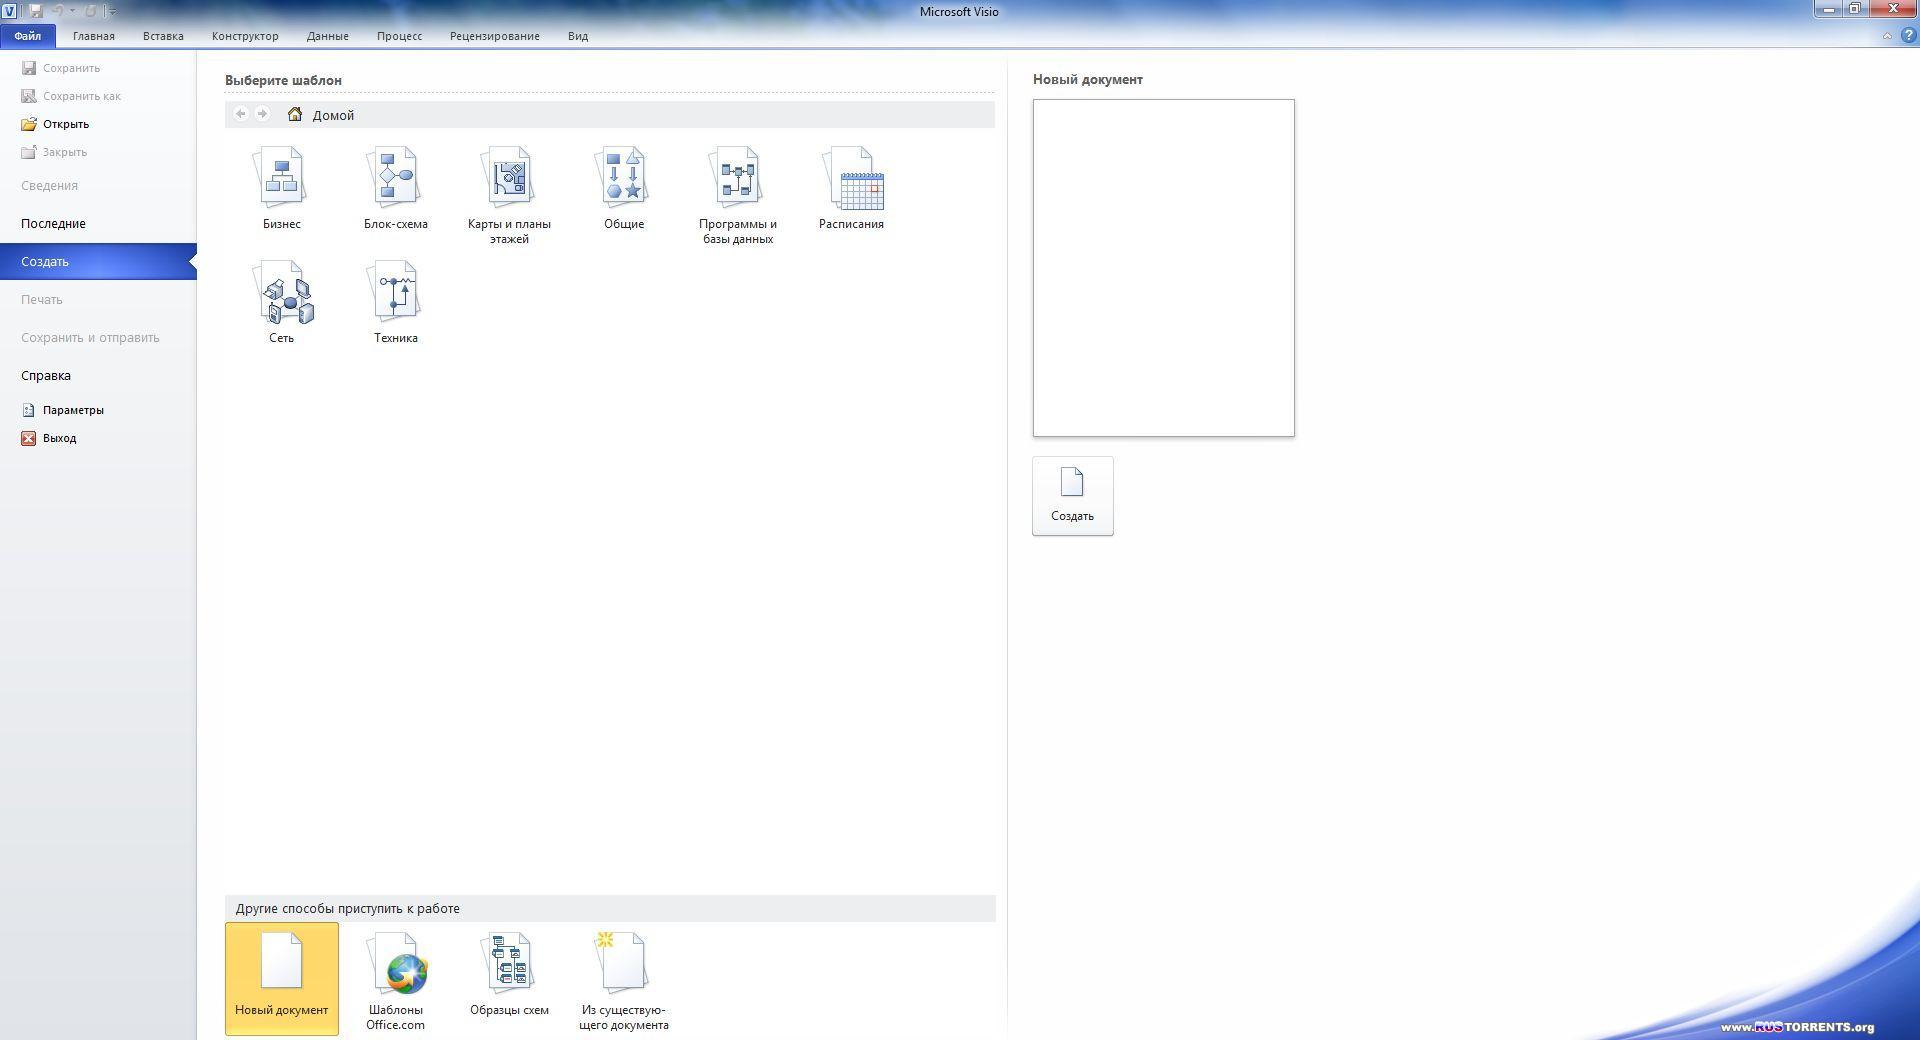 Microsoft Visio 2010 SP2 14.0.7015.1000 VL (Premium / Professional / Standard) x86/x64 (2013) RUS (Original Inside) RePack by Alliance